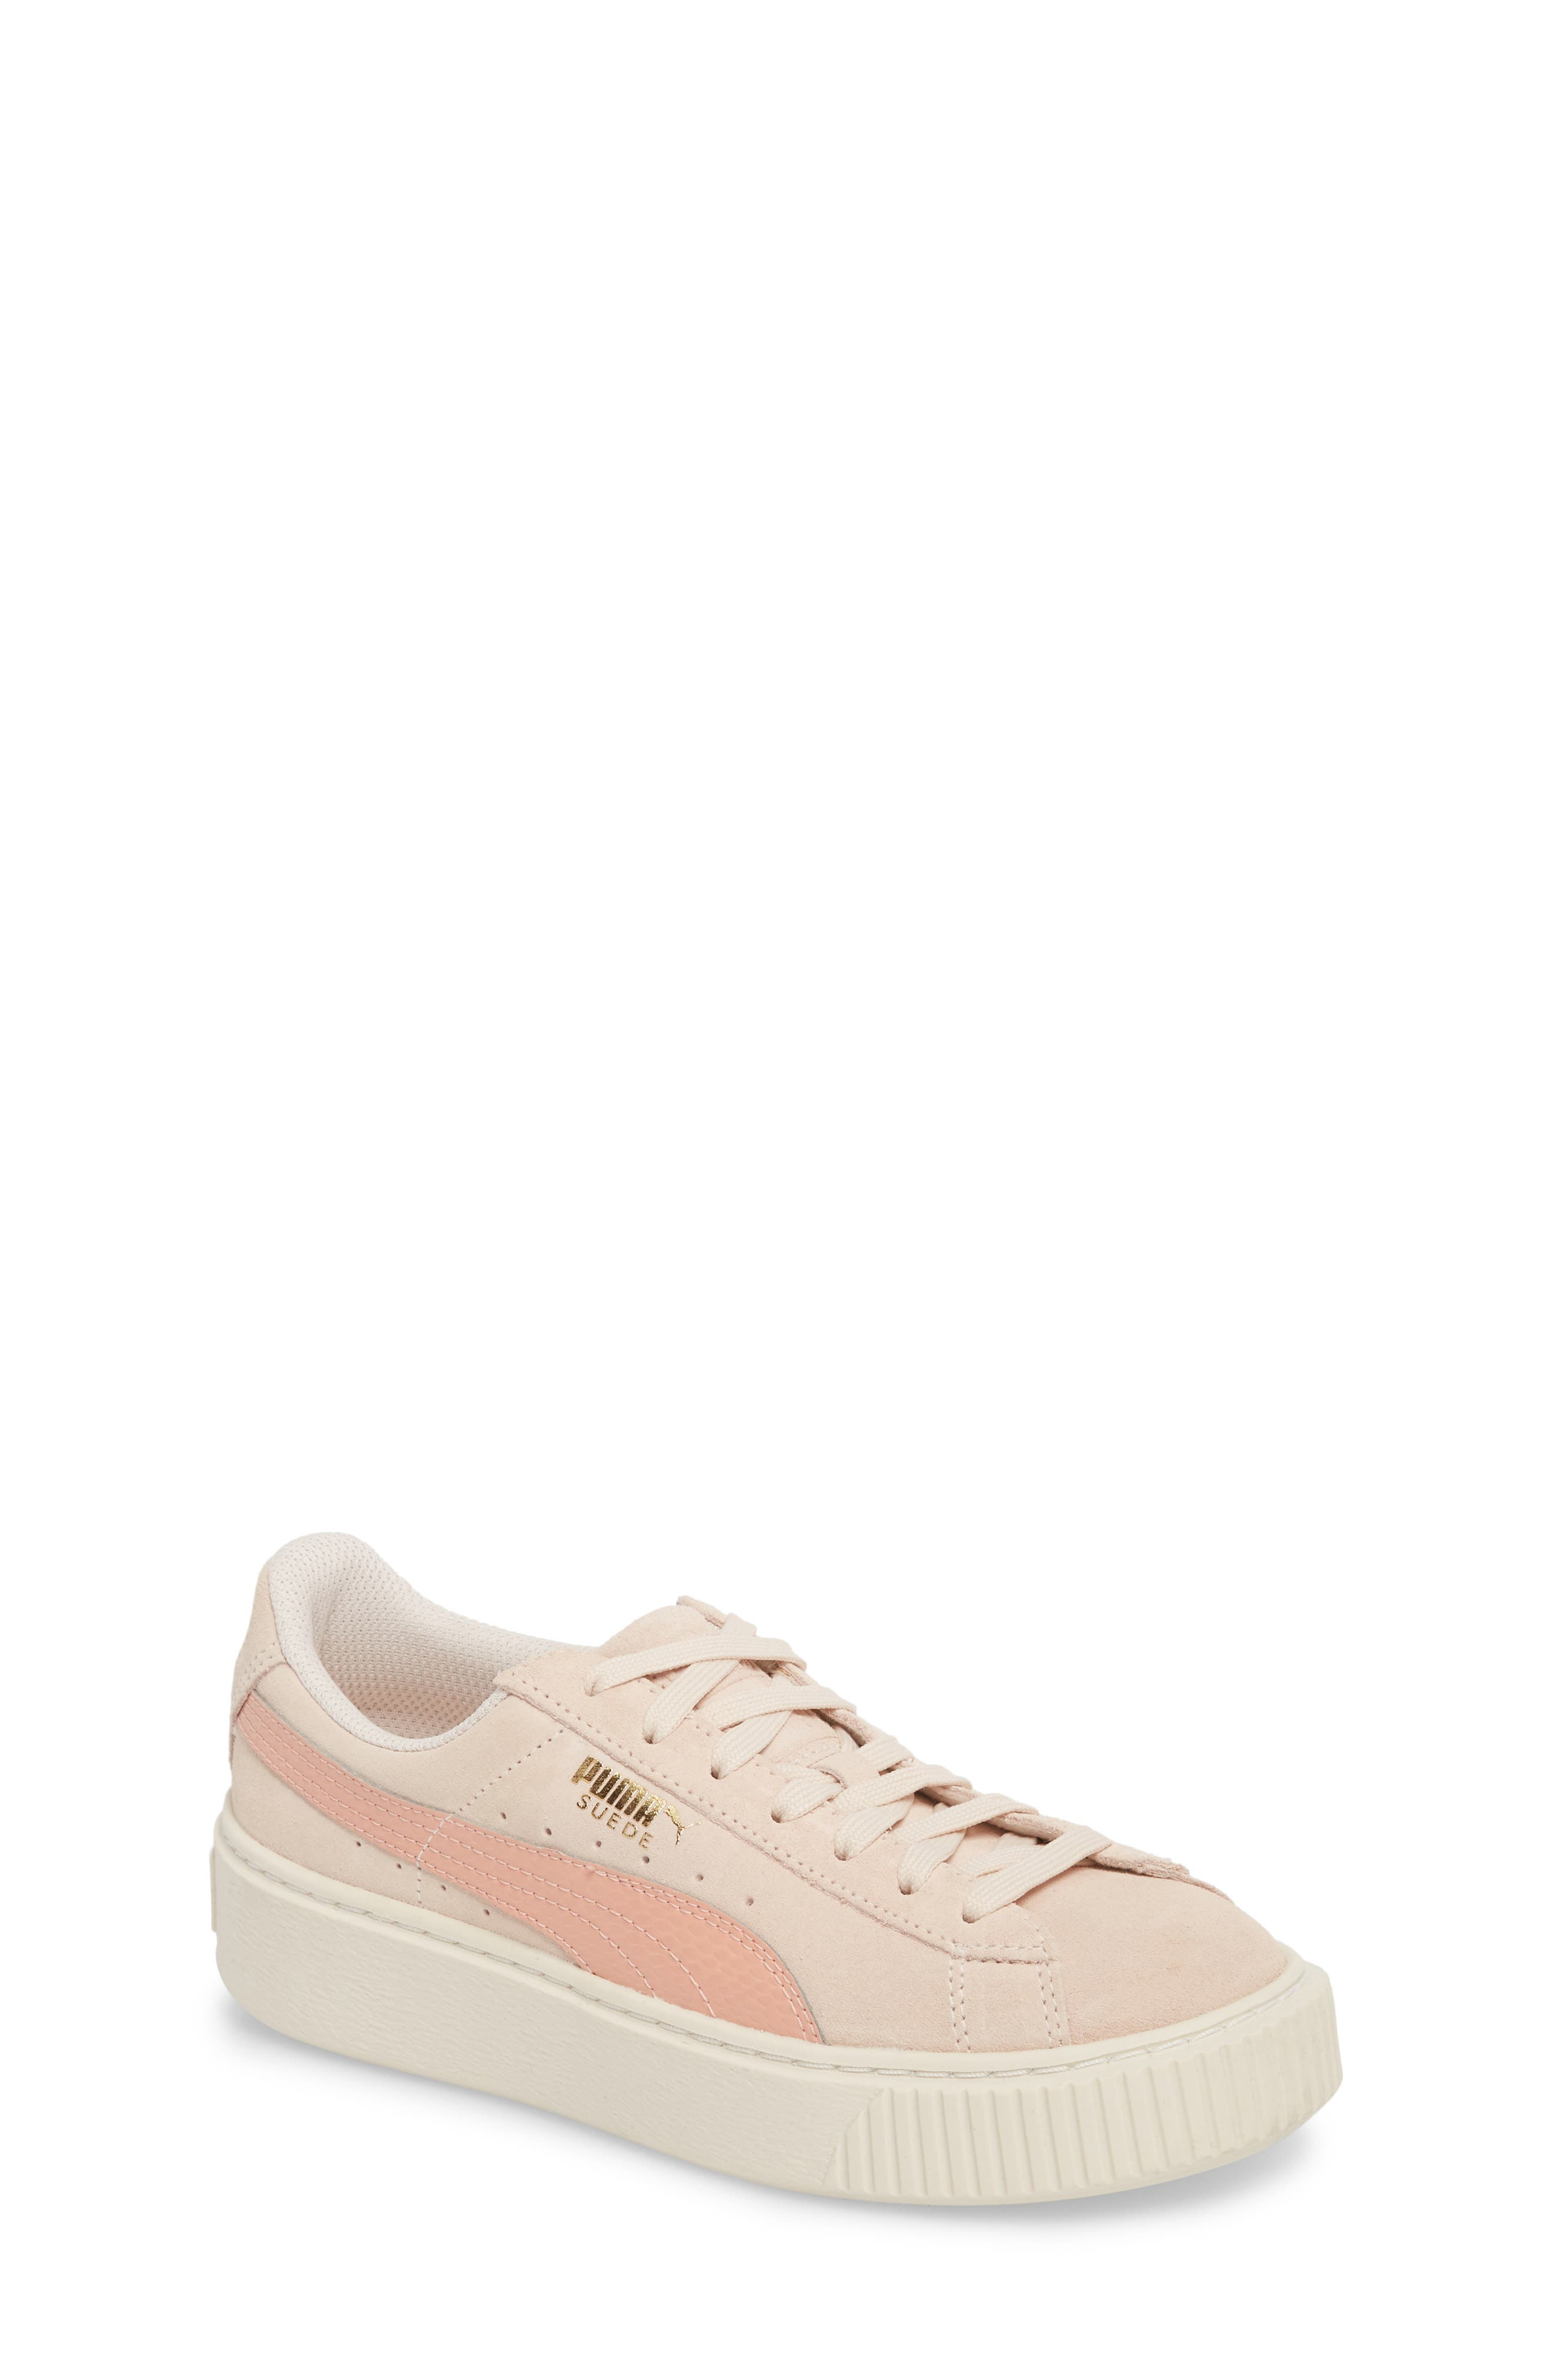 Suede Platform Jr Sneaker,                             Main thumbnail 1, color,                             Pearl/ Peach Beige